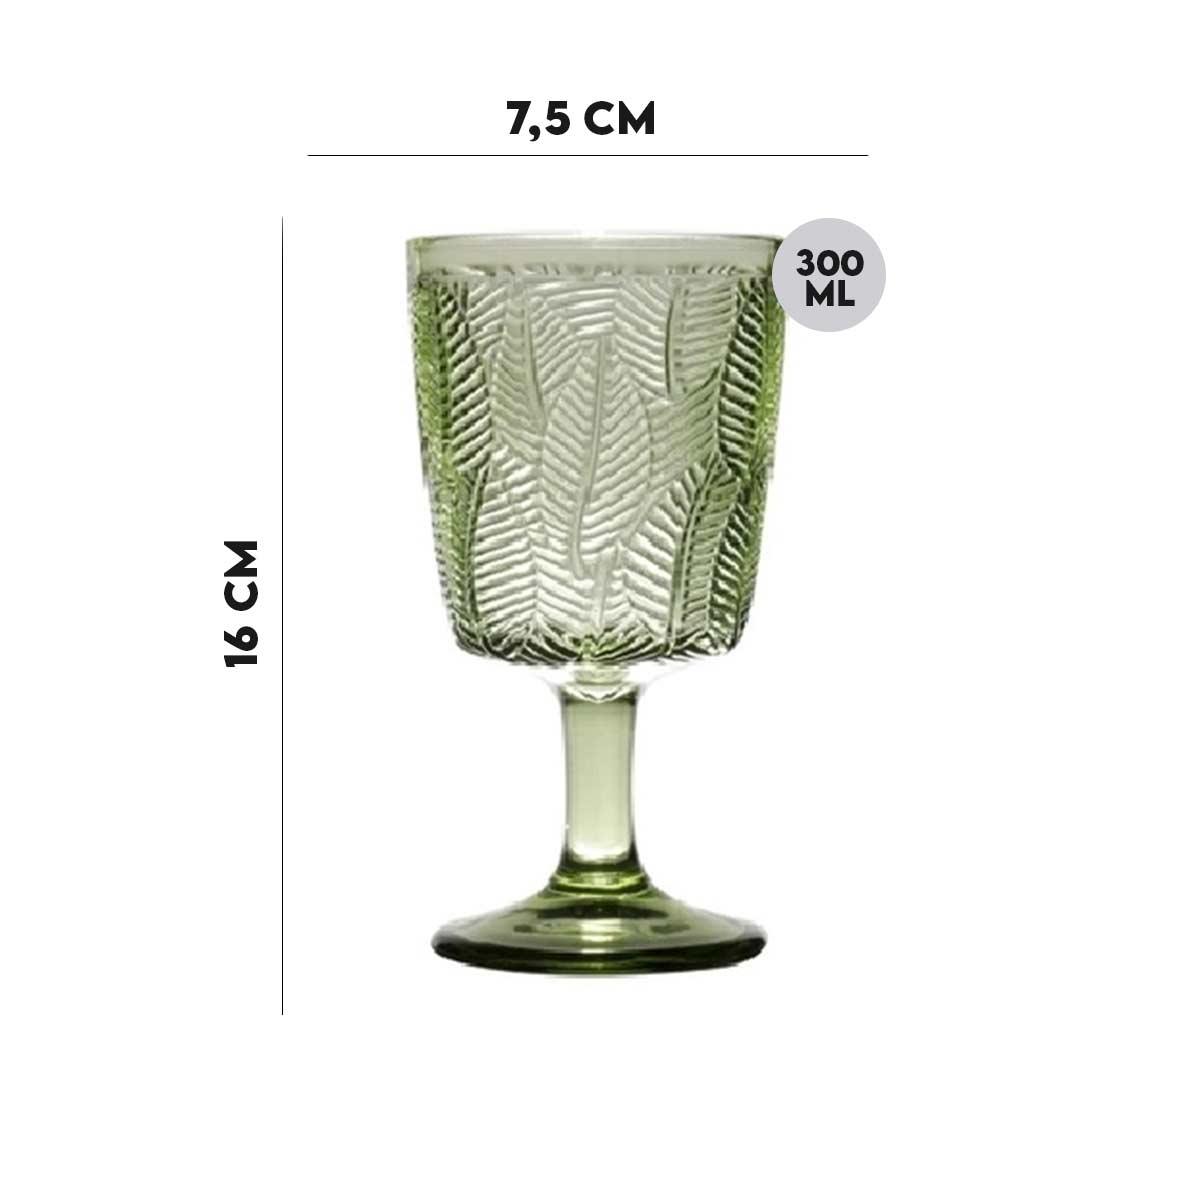 Kit 4 Taças p/ água Vidro Sodo-Cálcico Leaves Verde 300 ml  - Lemis